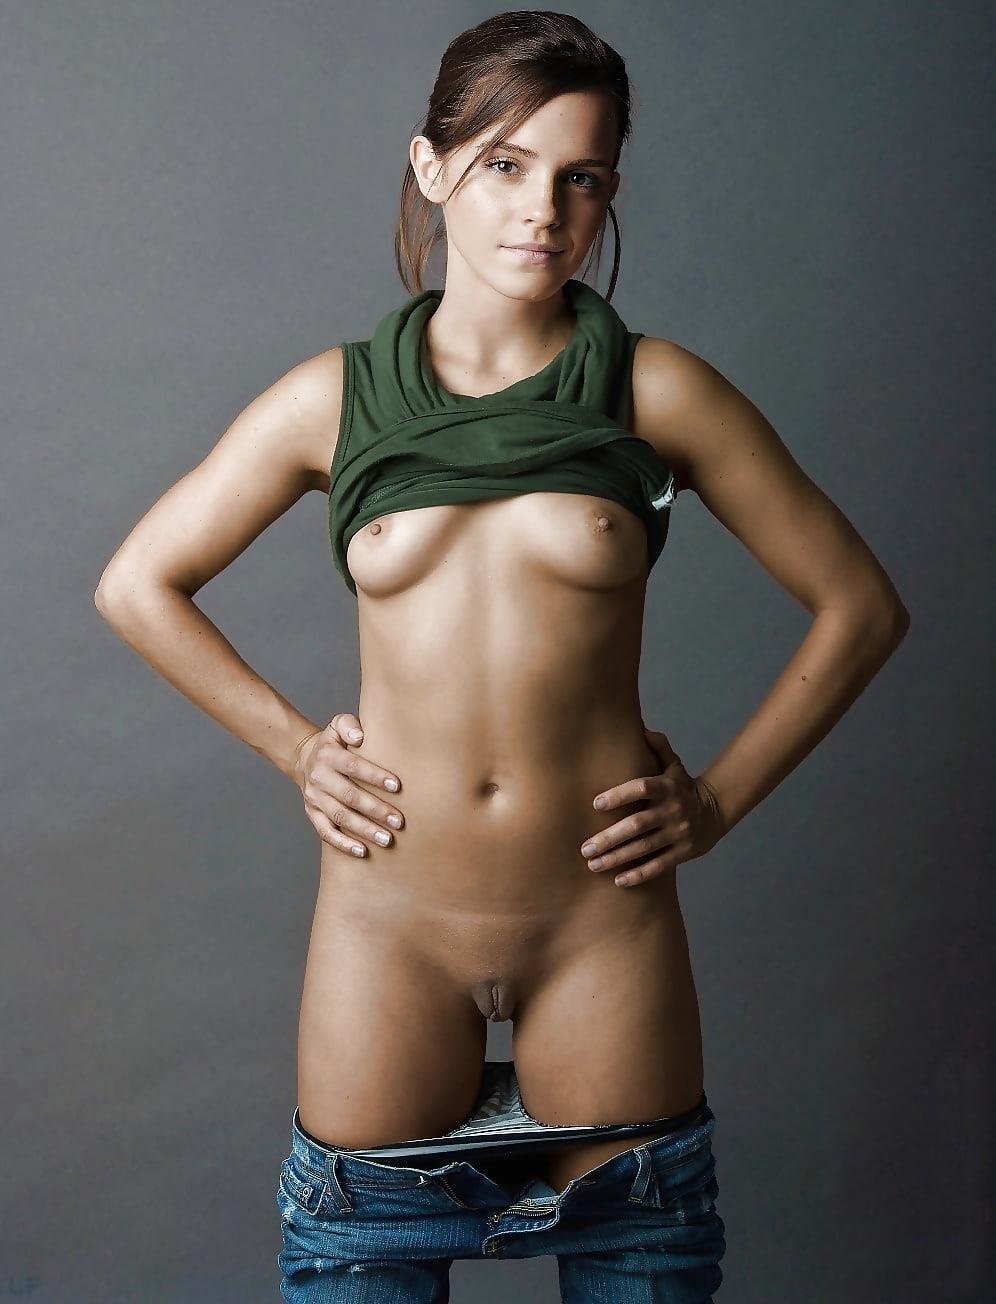 Emma watson nude news-4014